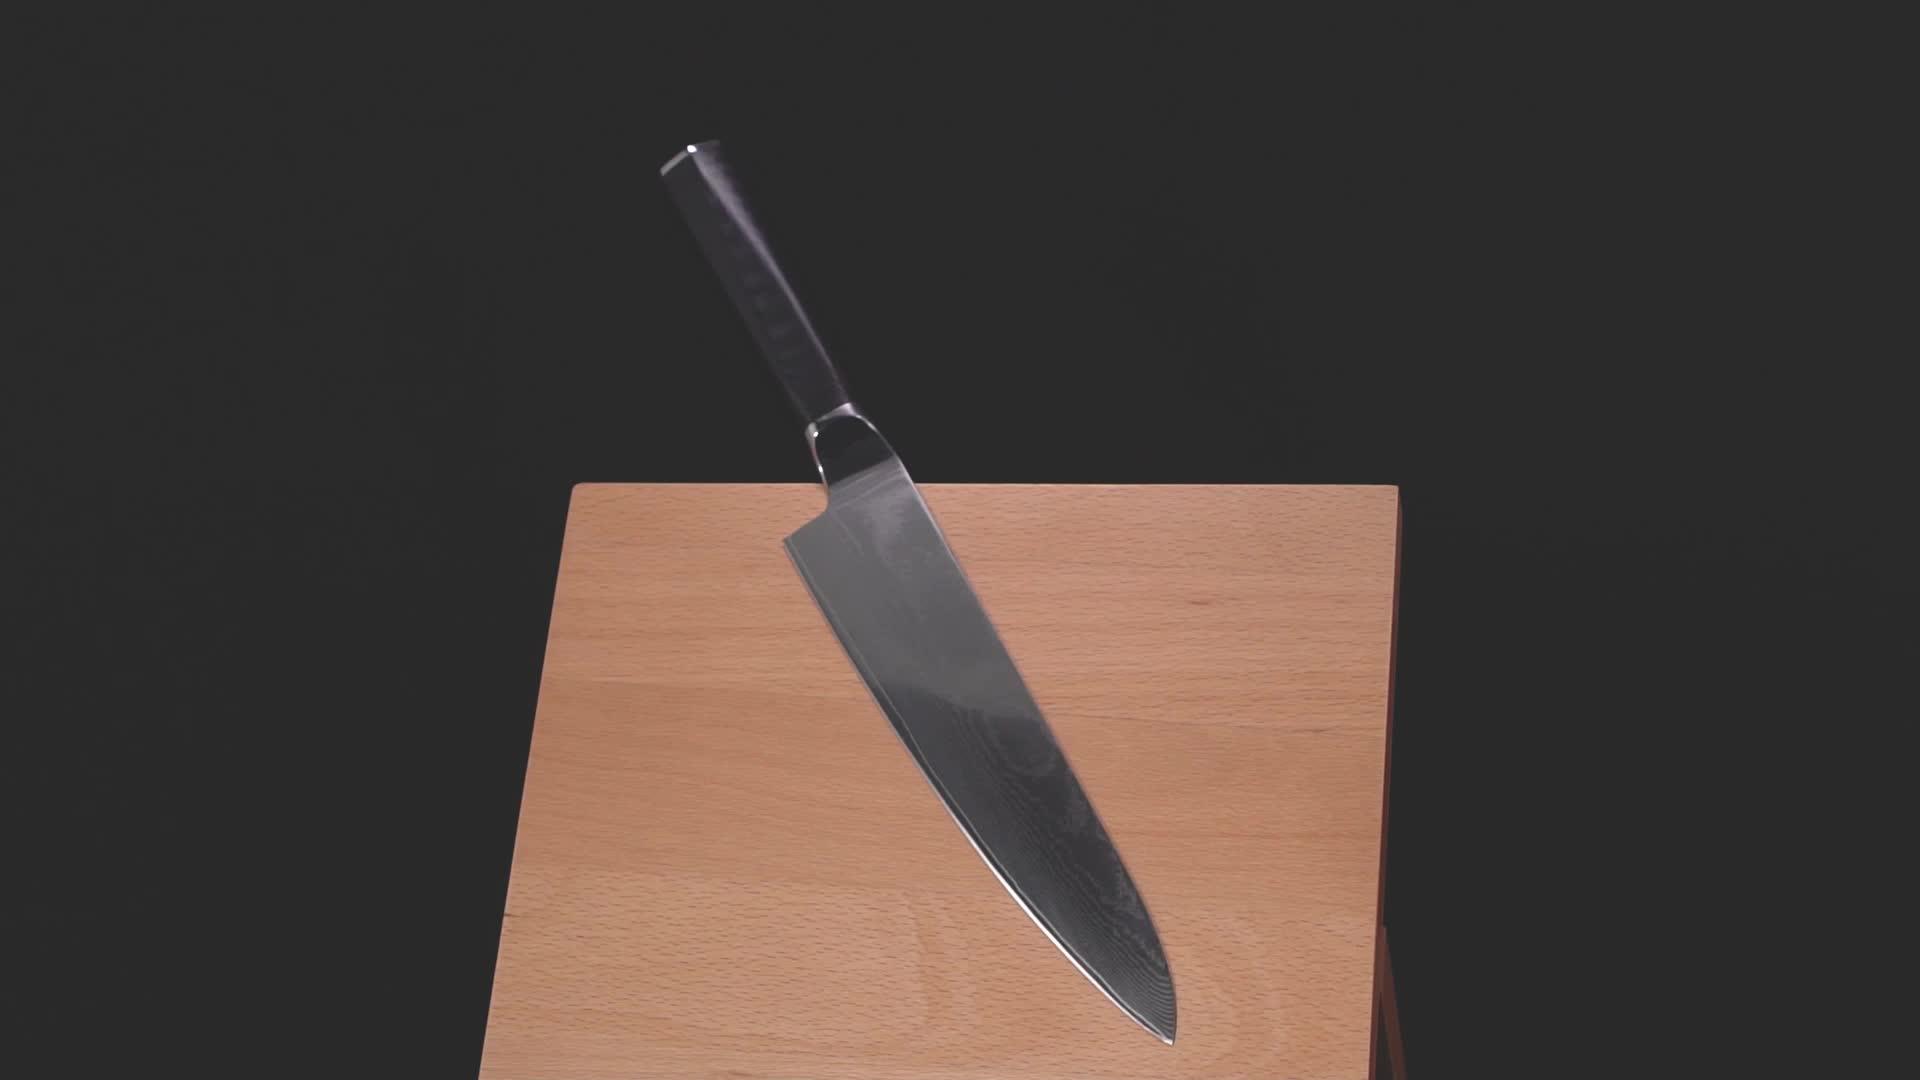 Premium Knife For Kitchen - Japanese Knife Steel - Comfortable Grip - Sharp Edge